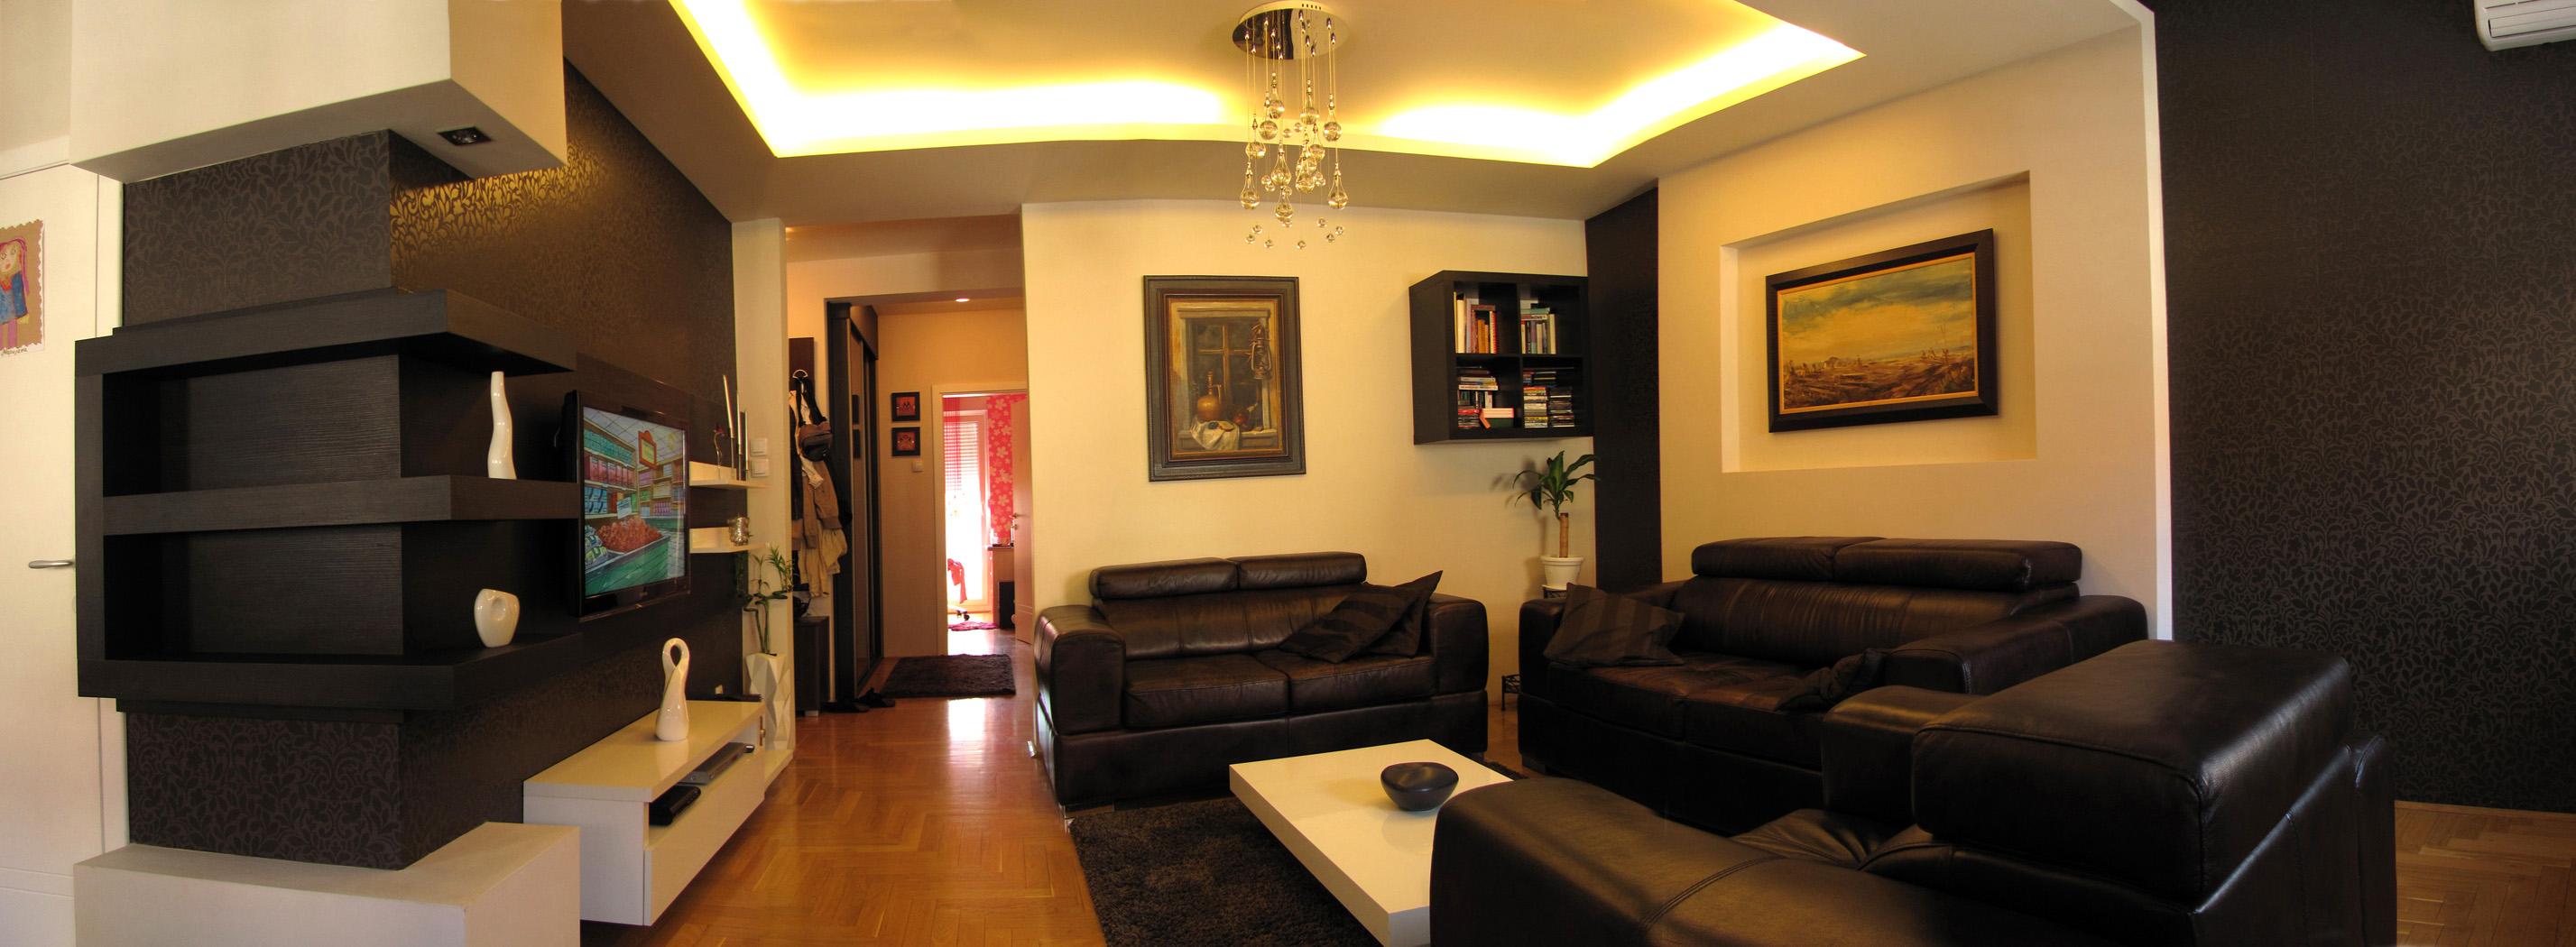 0021_LIVING ROOM